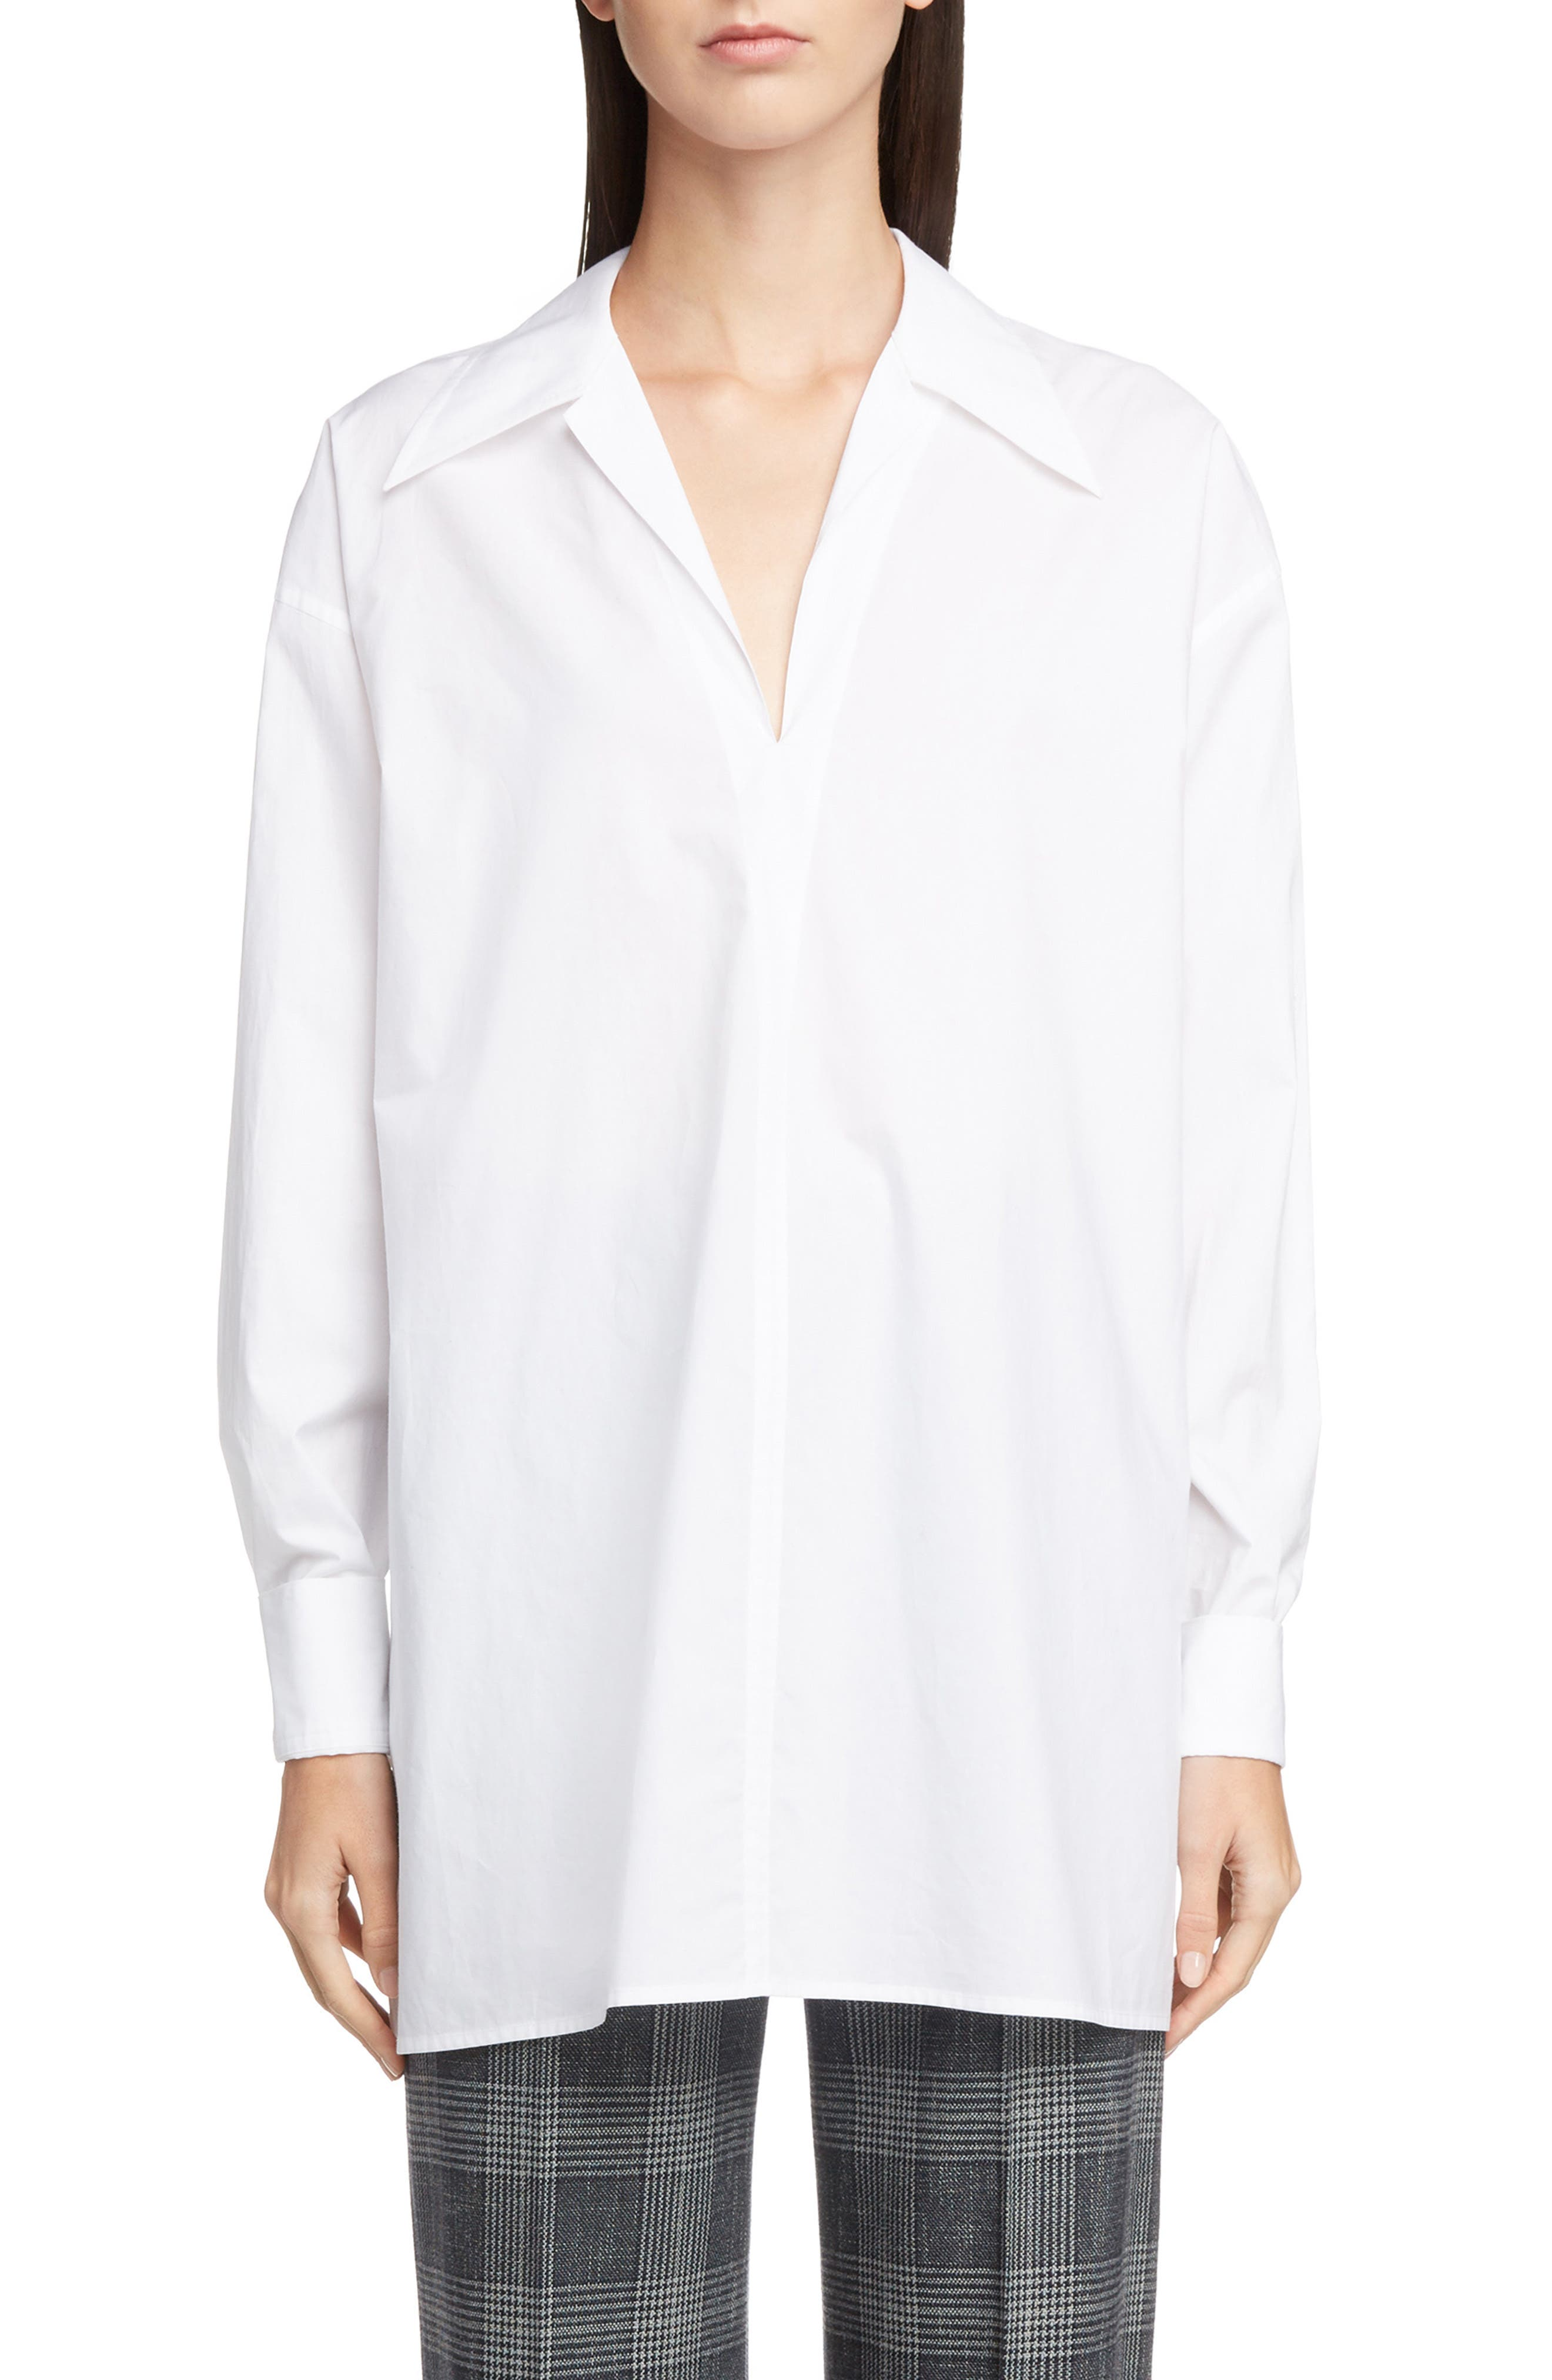 ACNE STUDIOS Spread Collar Shirt, Main, color, WHITE